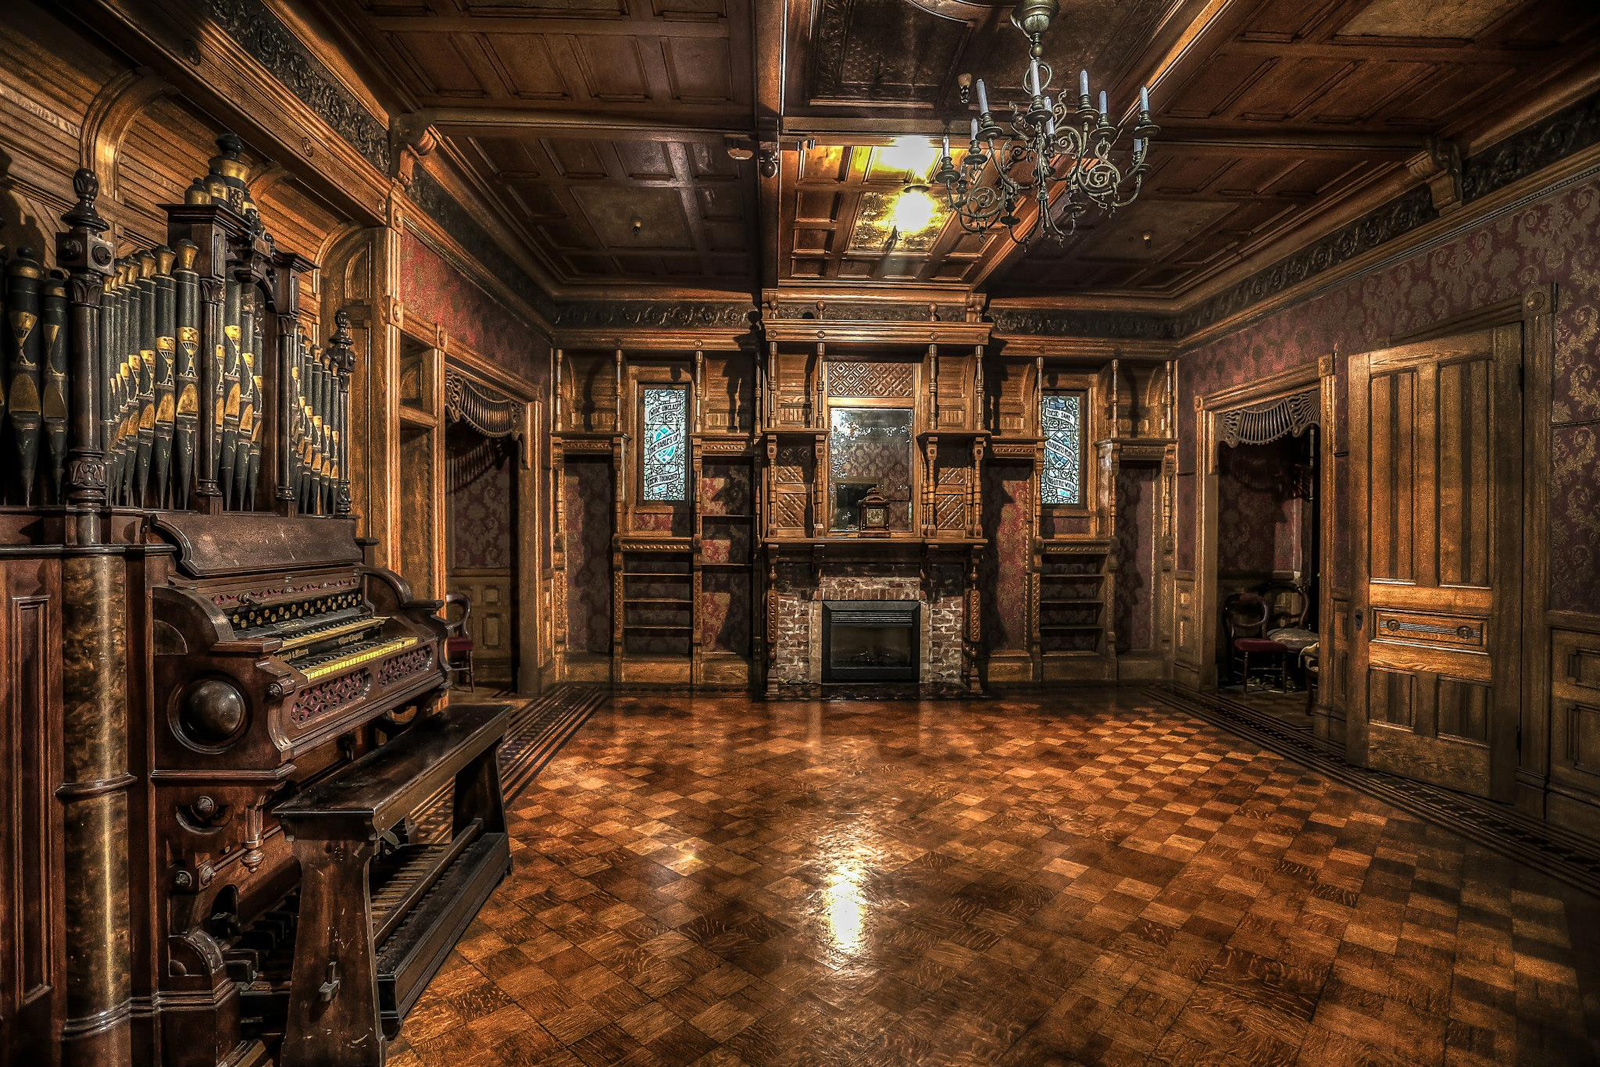 winchestermysteryhouse.com